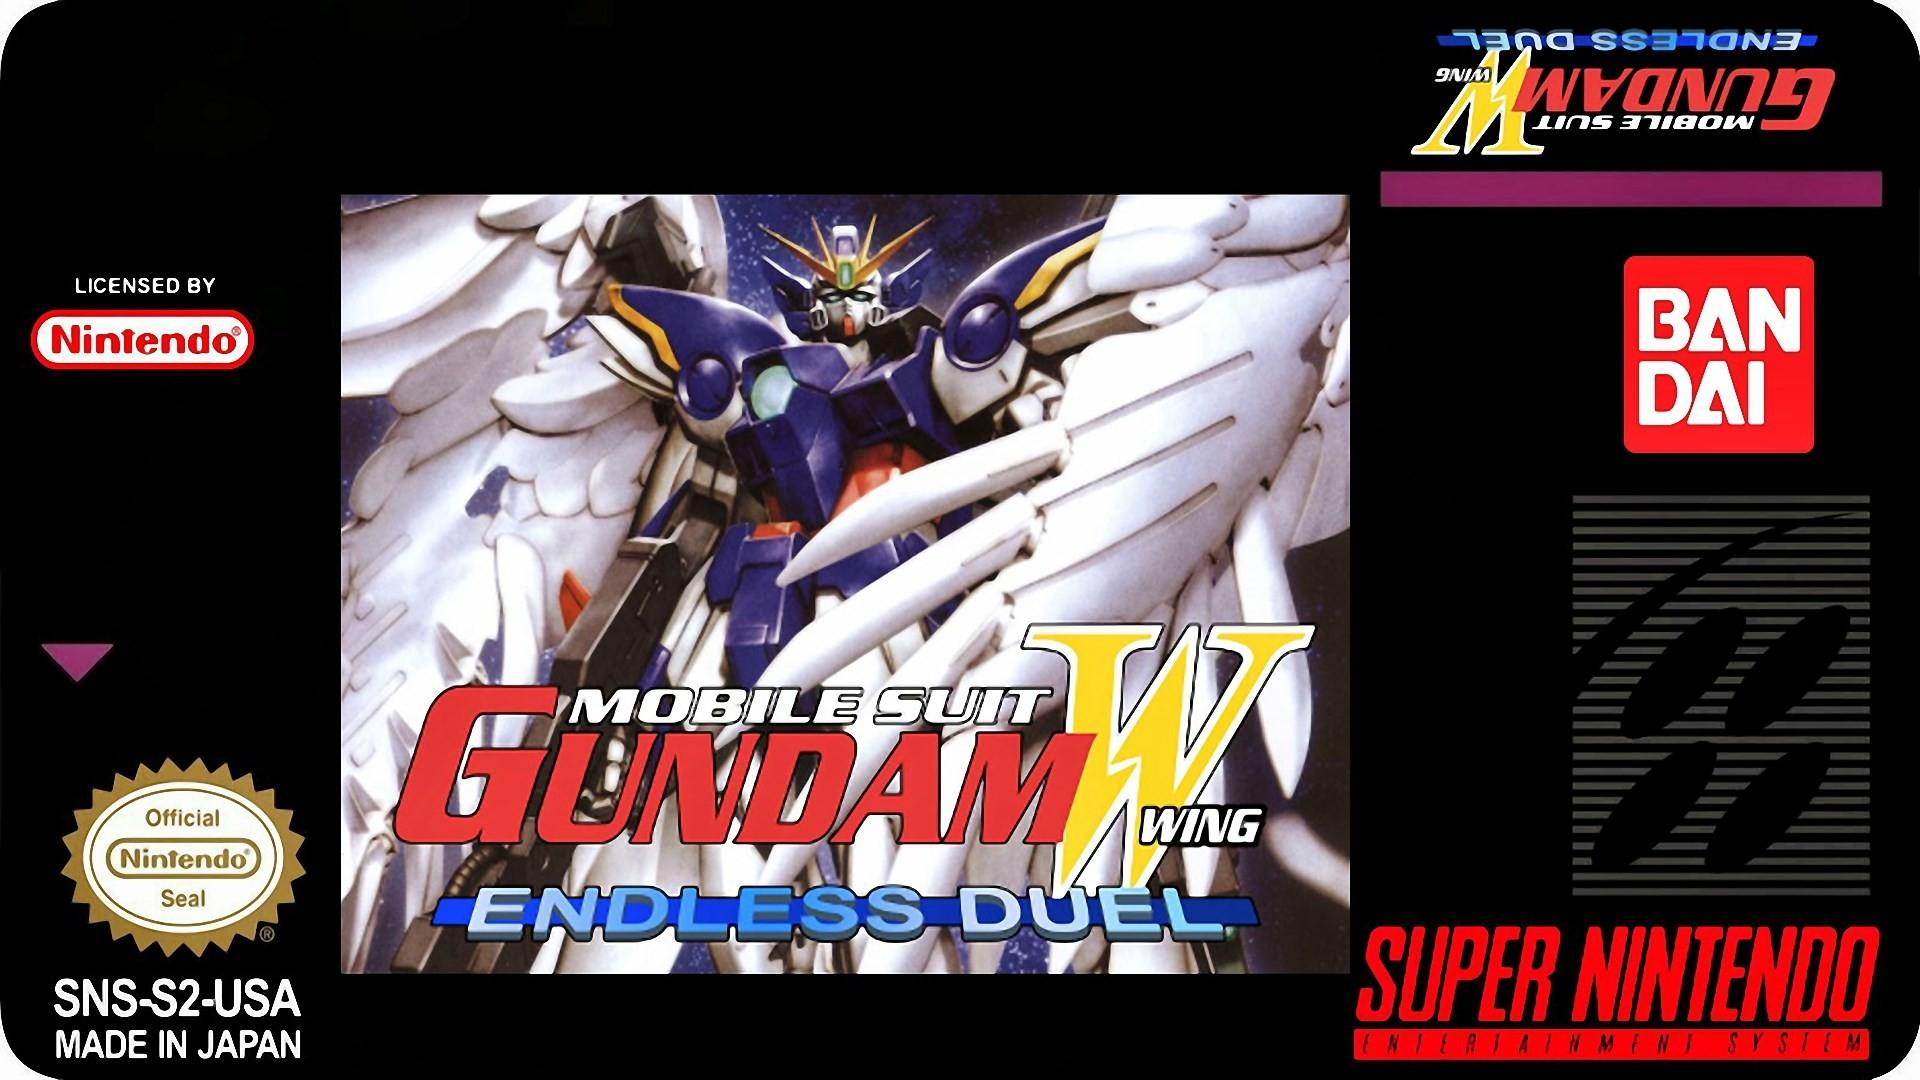 free screensaver wallpapers for gundam wing endless duel, (333 kB)